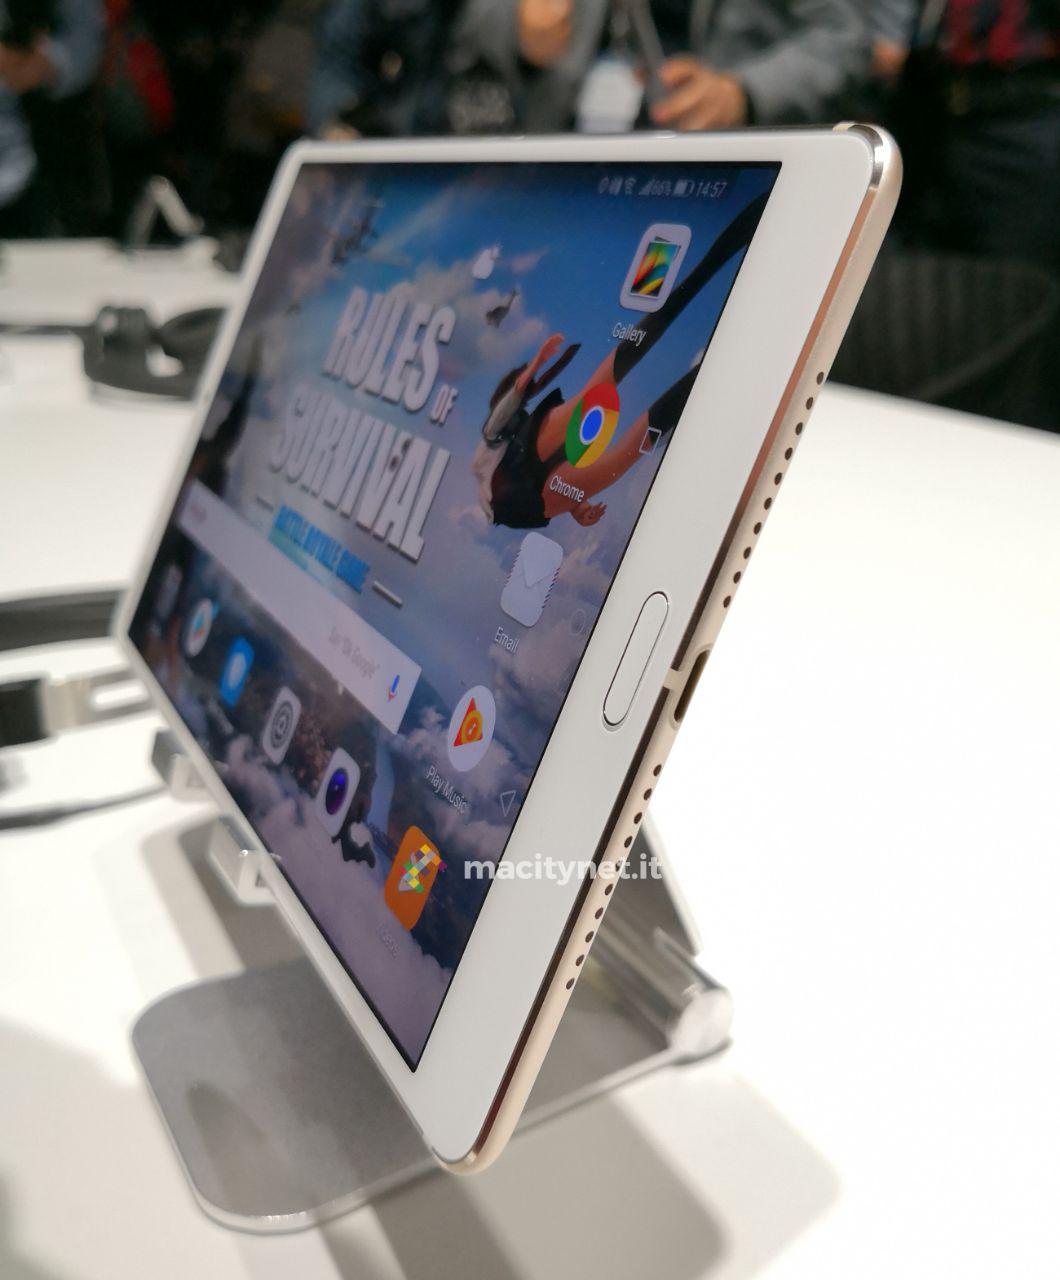 Schemi Elettrici Huawei : Al mwc 2018 huawei lancia mediapad m5 primo tablet al mondo con